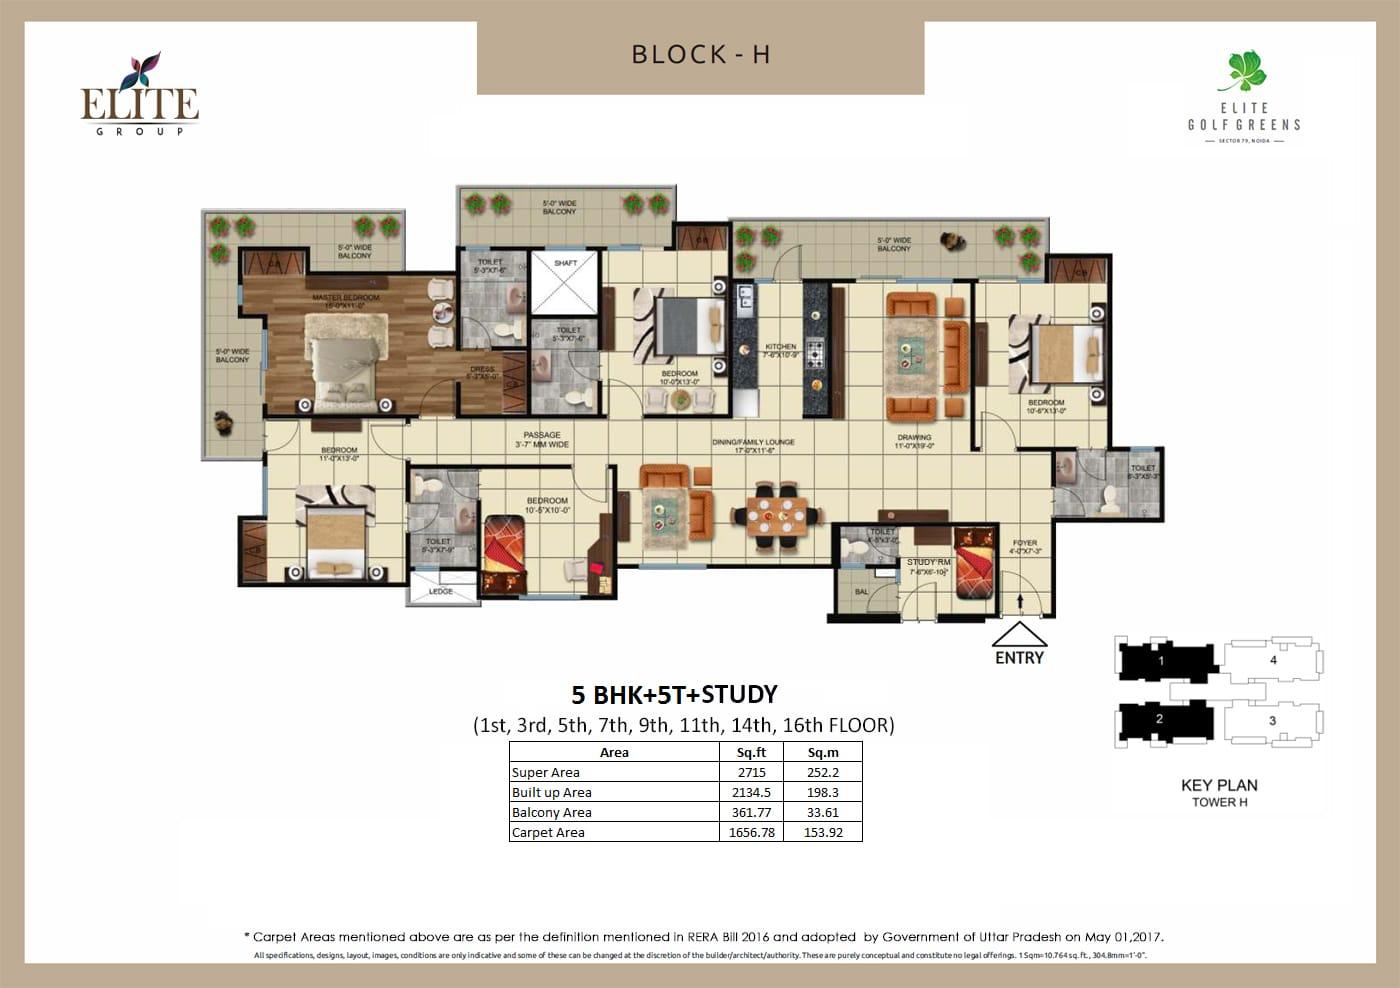 EliteGolf Greens Floor Plan 9